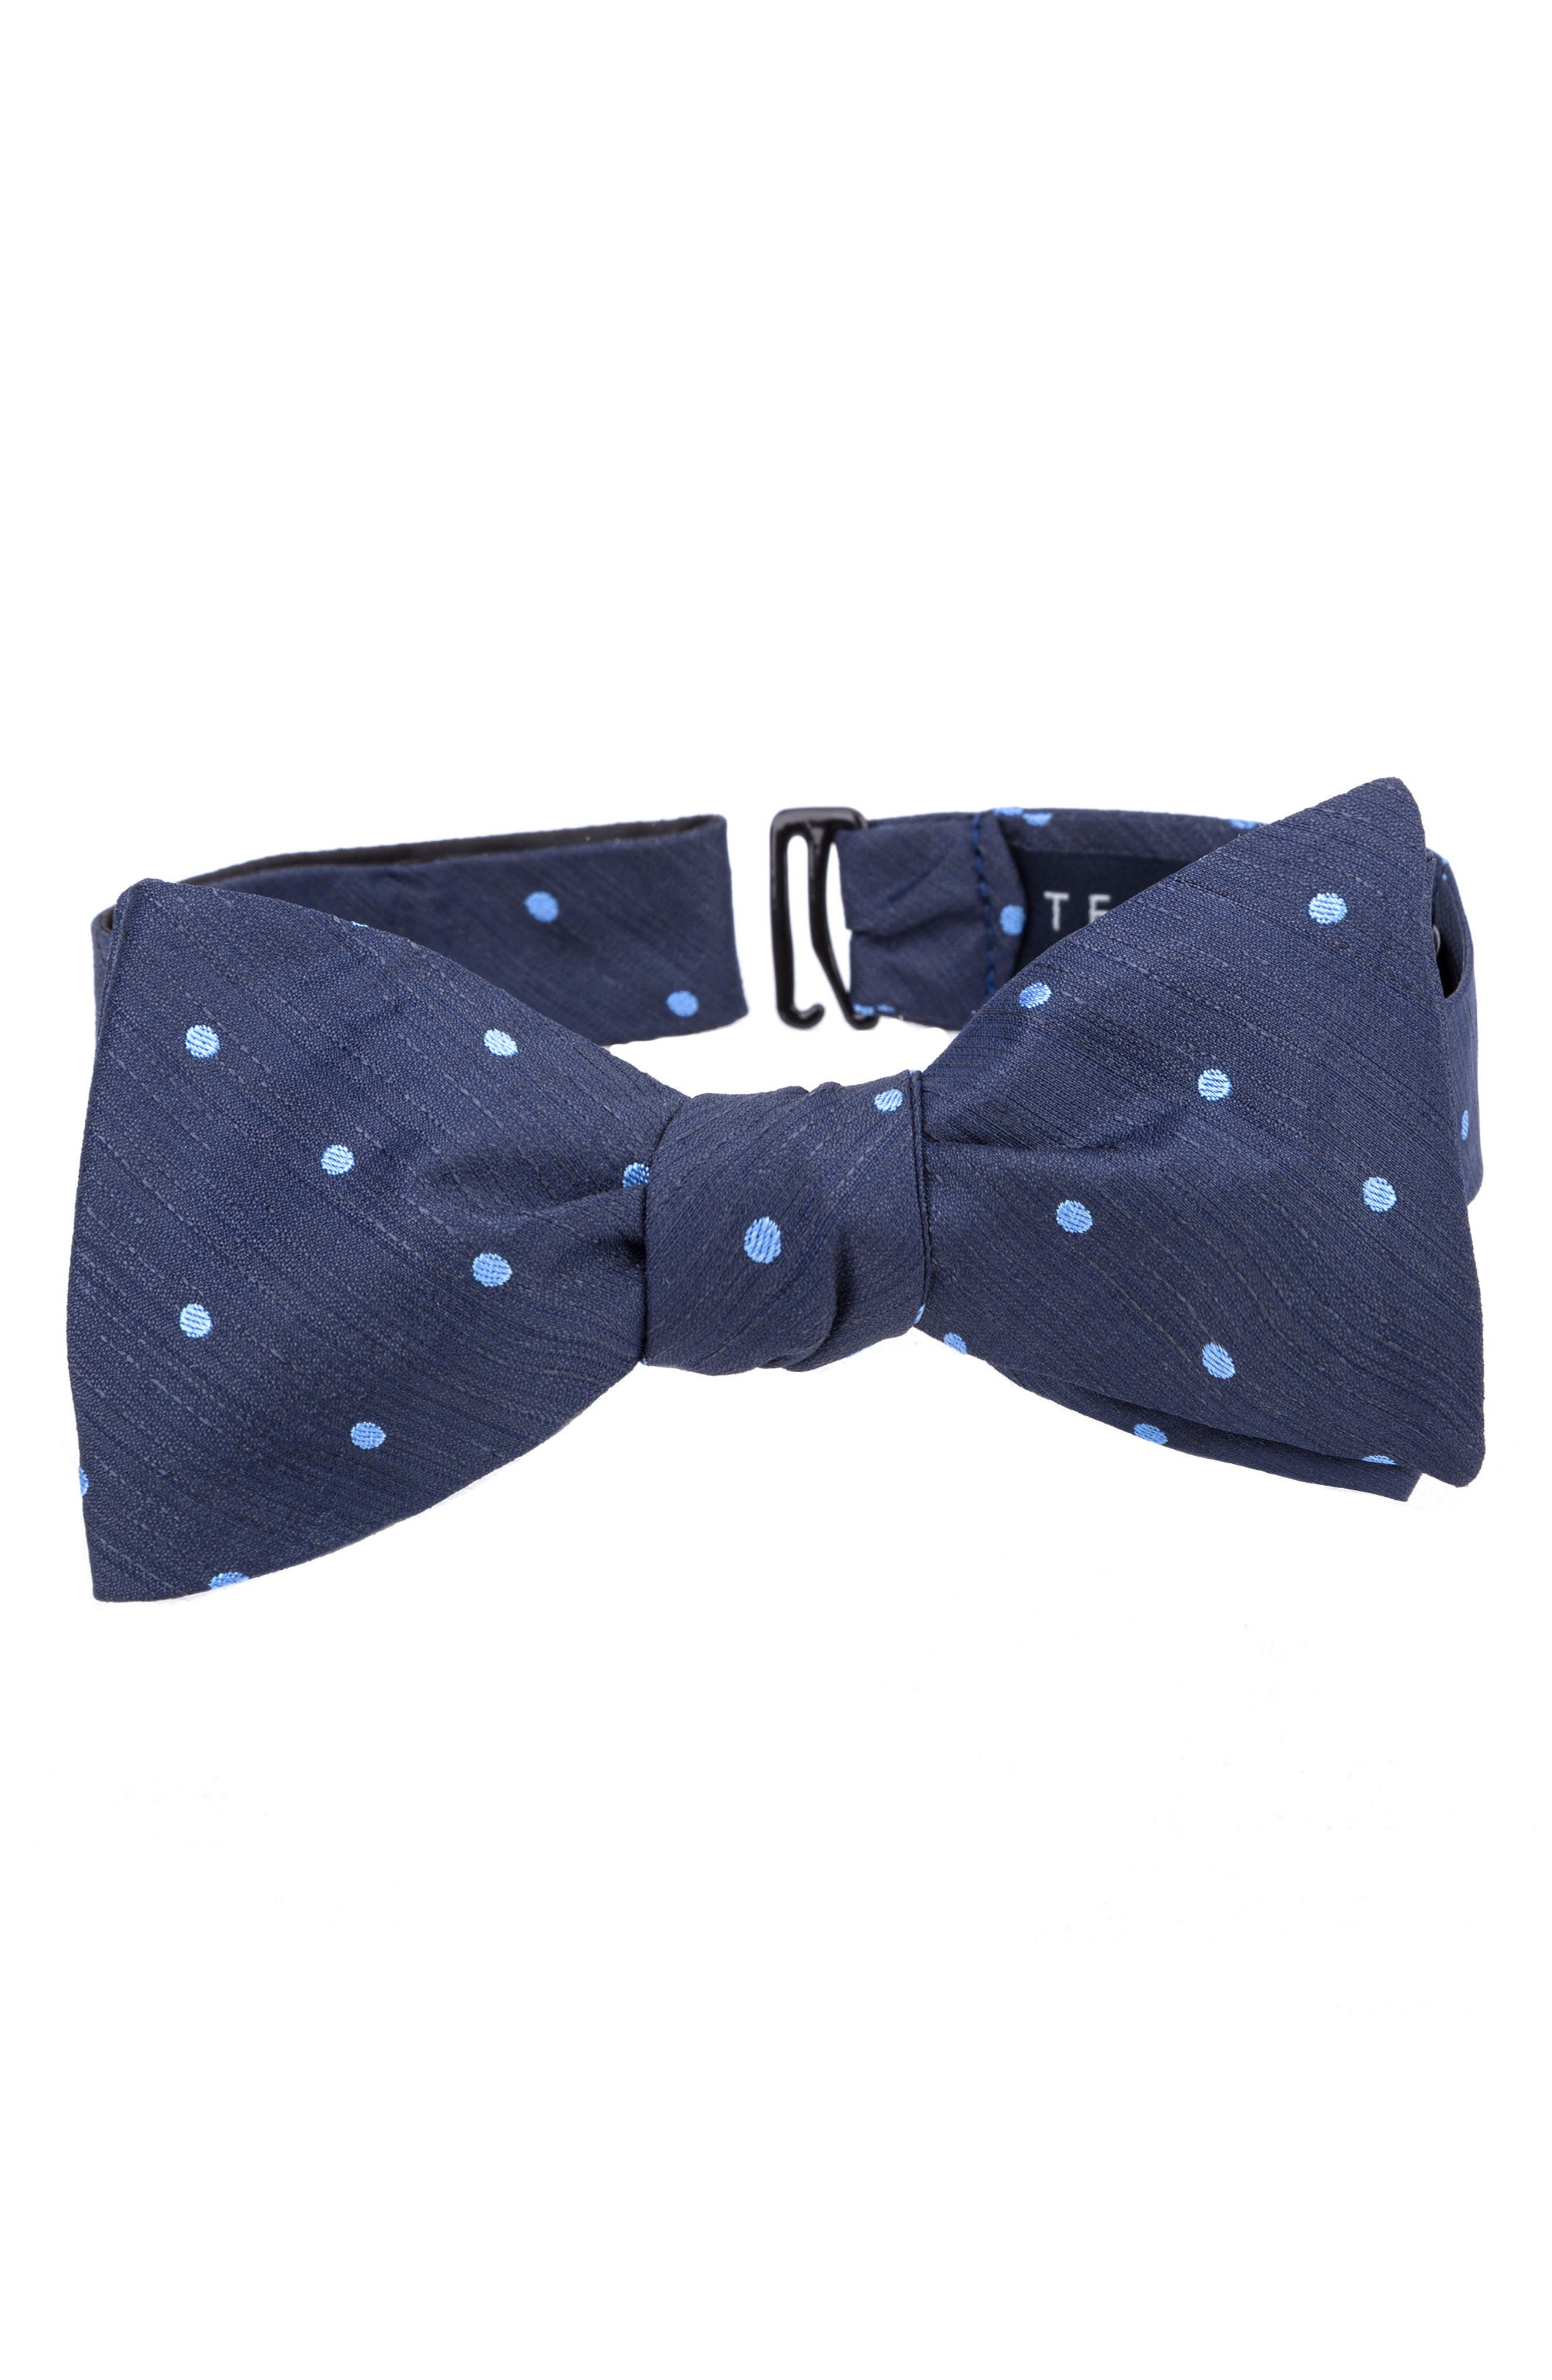 Grand Dot Silk Bow Tie,                             Main thumbnail 1, color,                             020